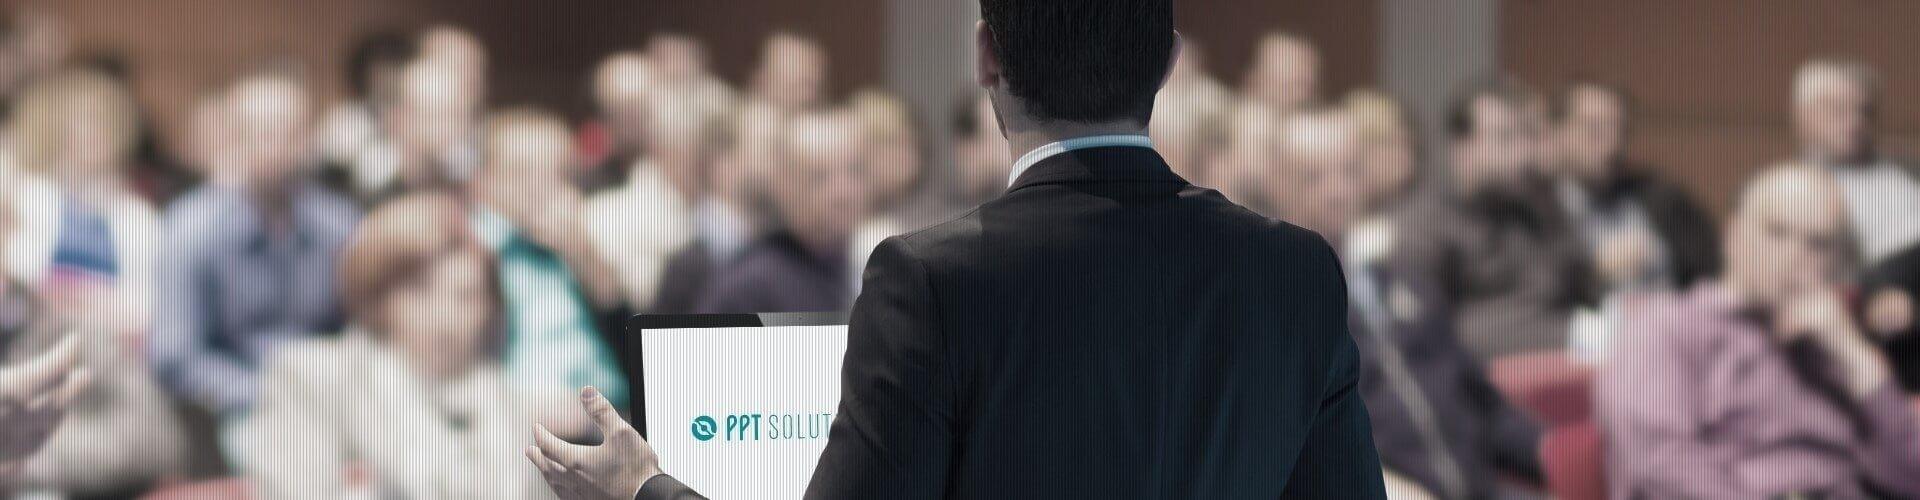 Professionele PowerPoint presentatie